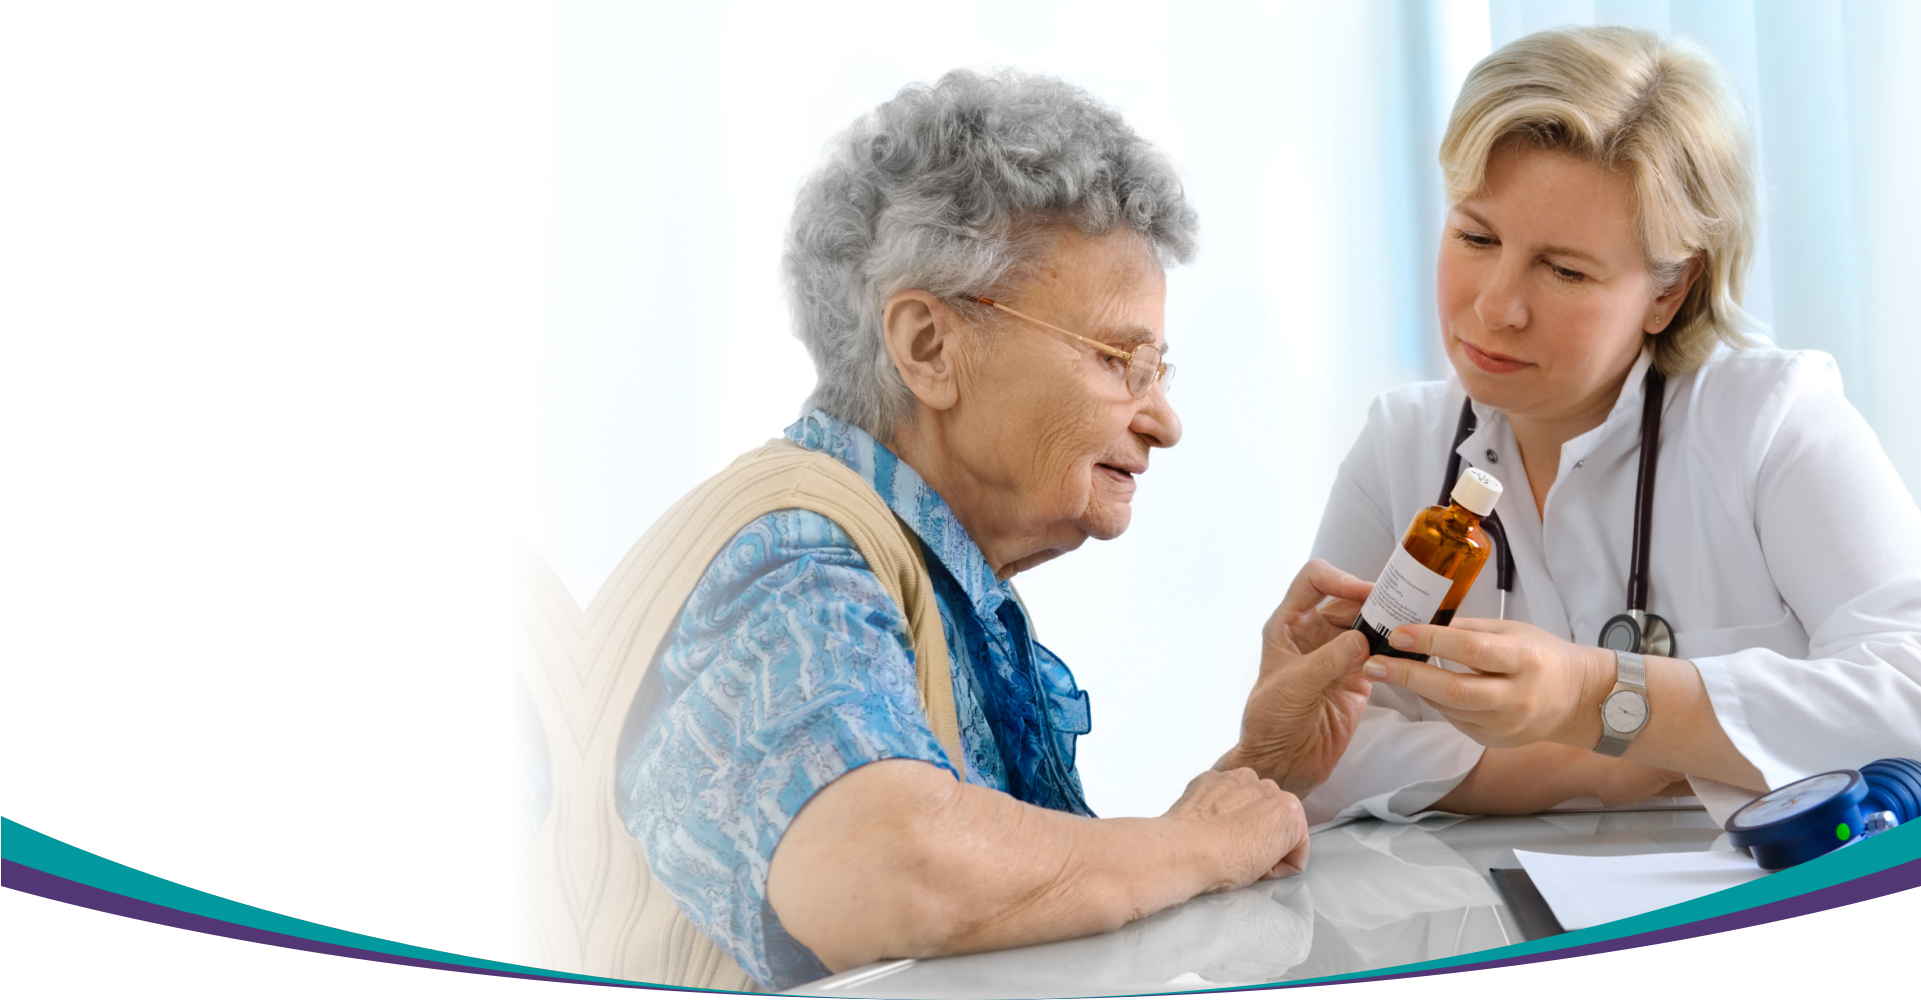 doctor shows medicine to elder woman